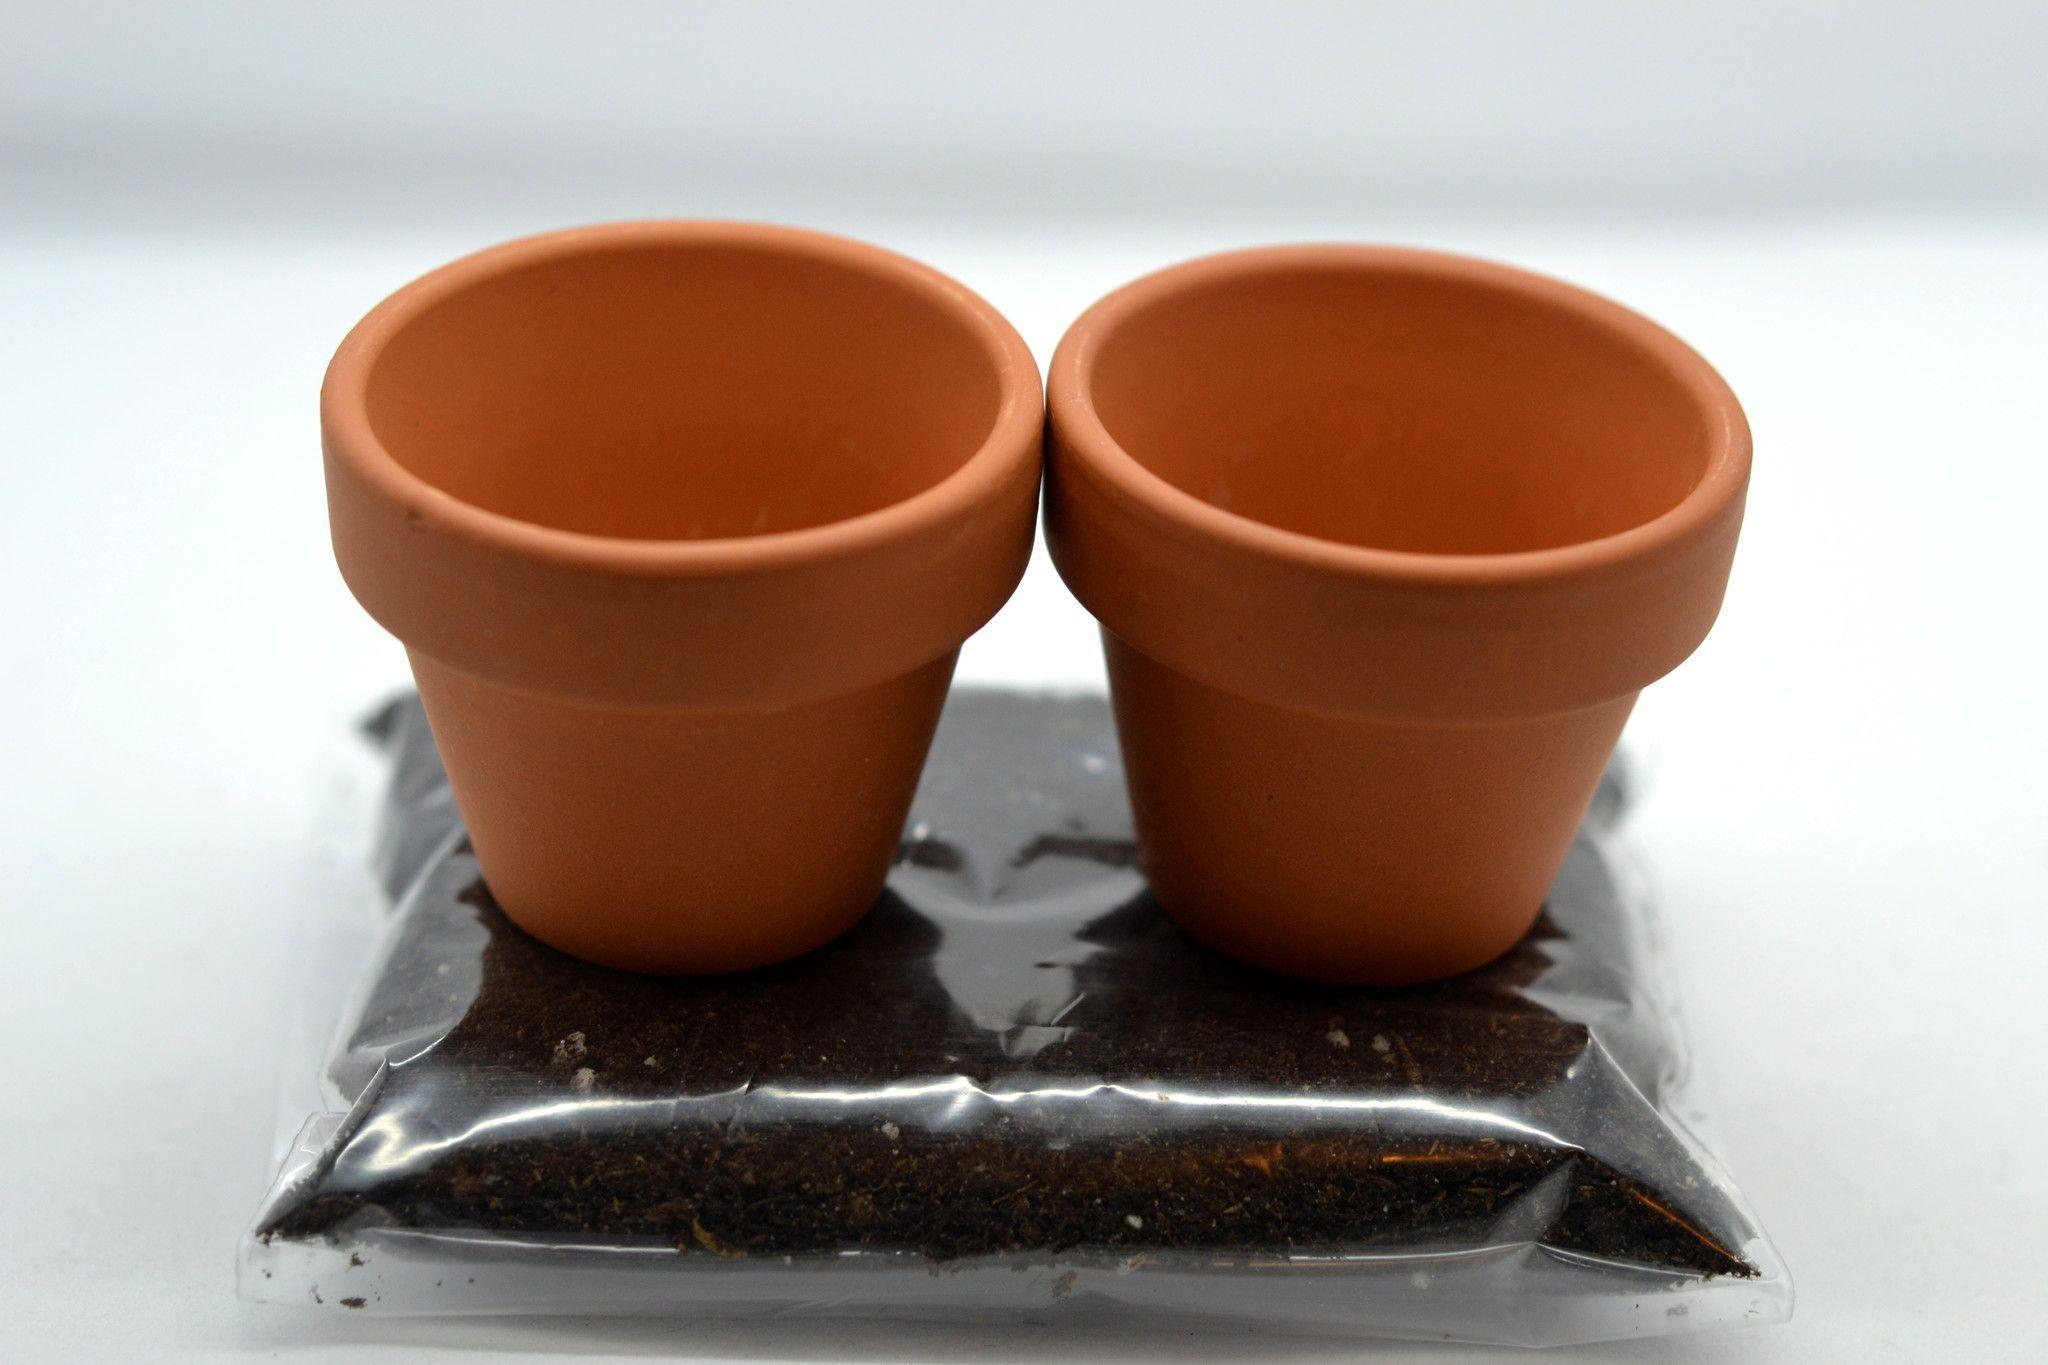 Miniature Clay Pot With Cactus Soil Transplanting Kit 2 Pots Miniature Clay Pots Clay Ceramics Clay Pots